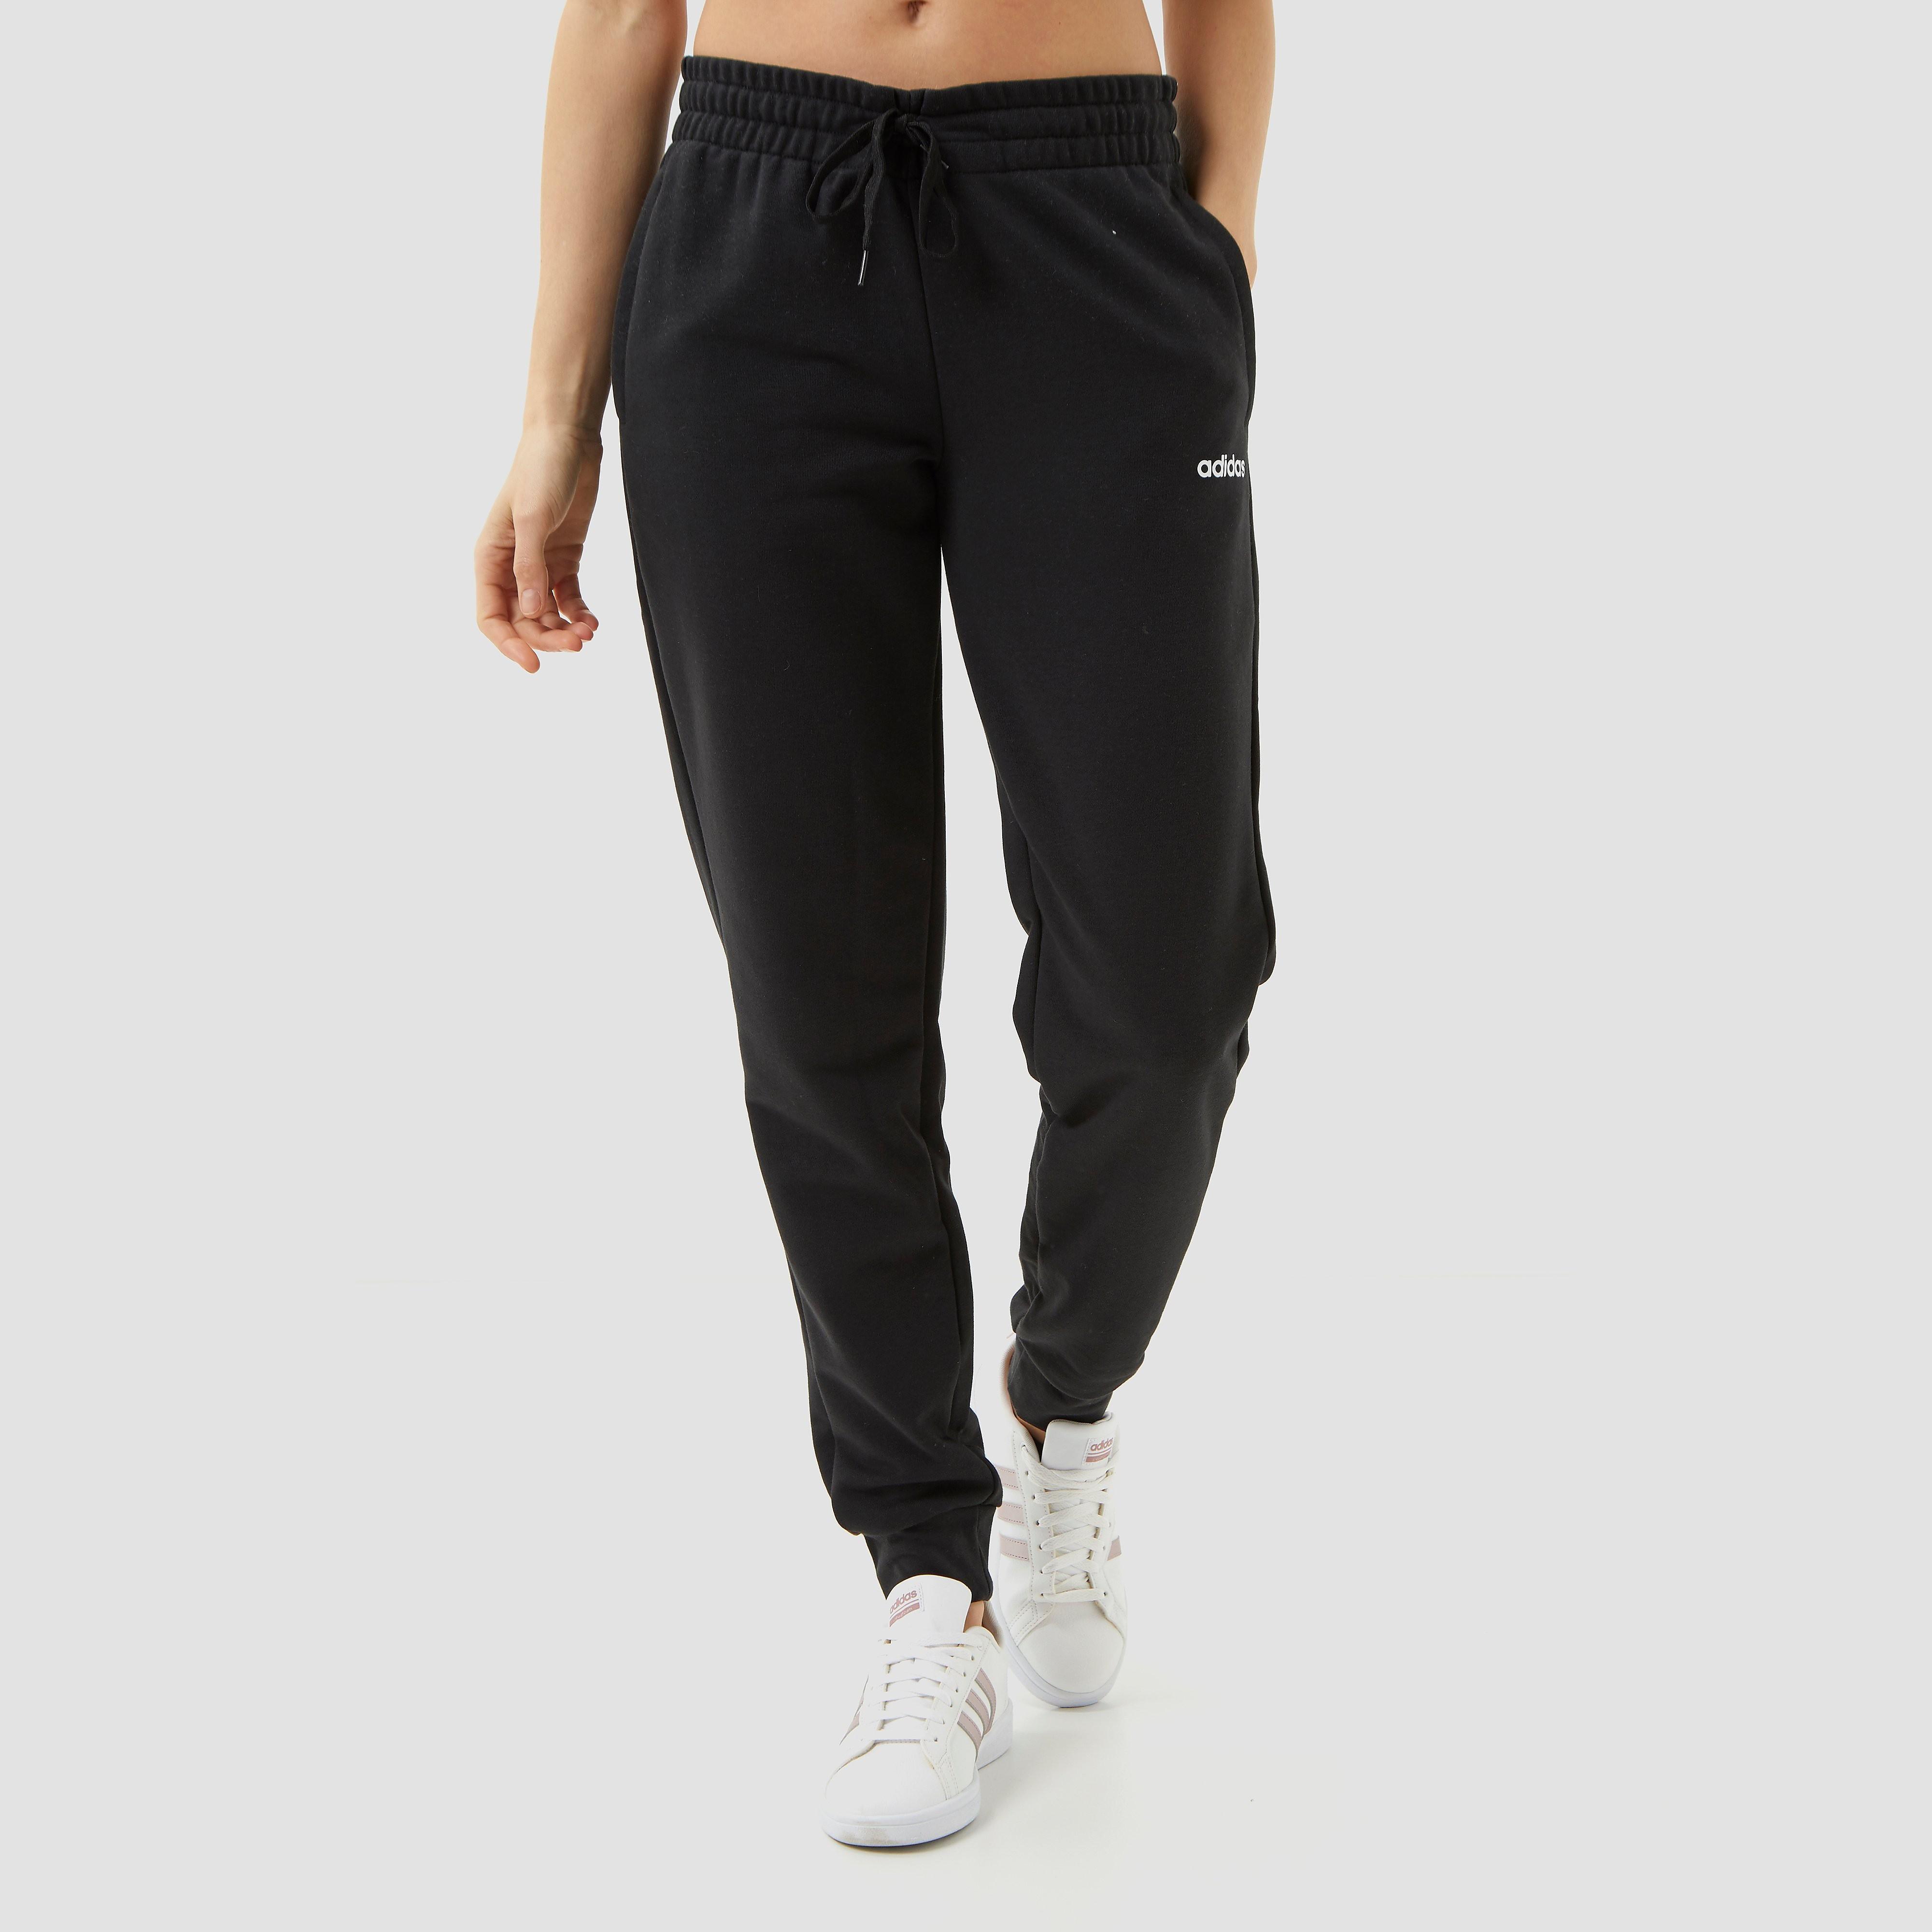 adidas Essentials plain joggingbroek zwart dames Dames